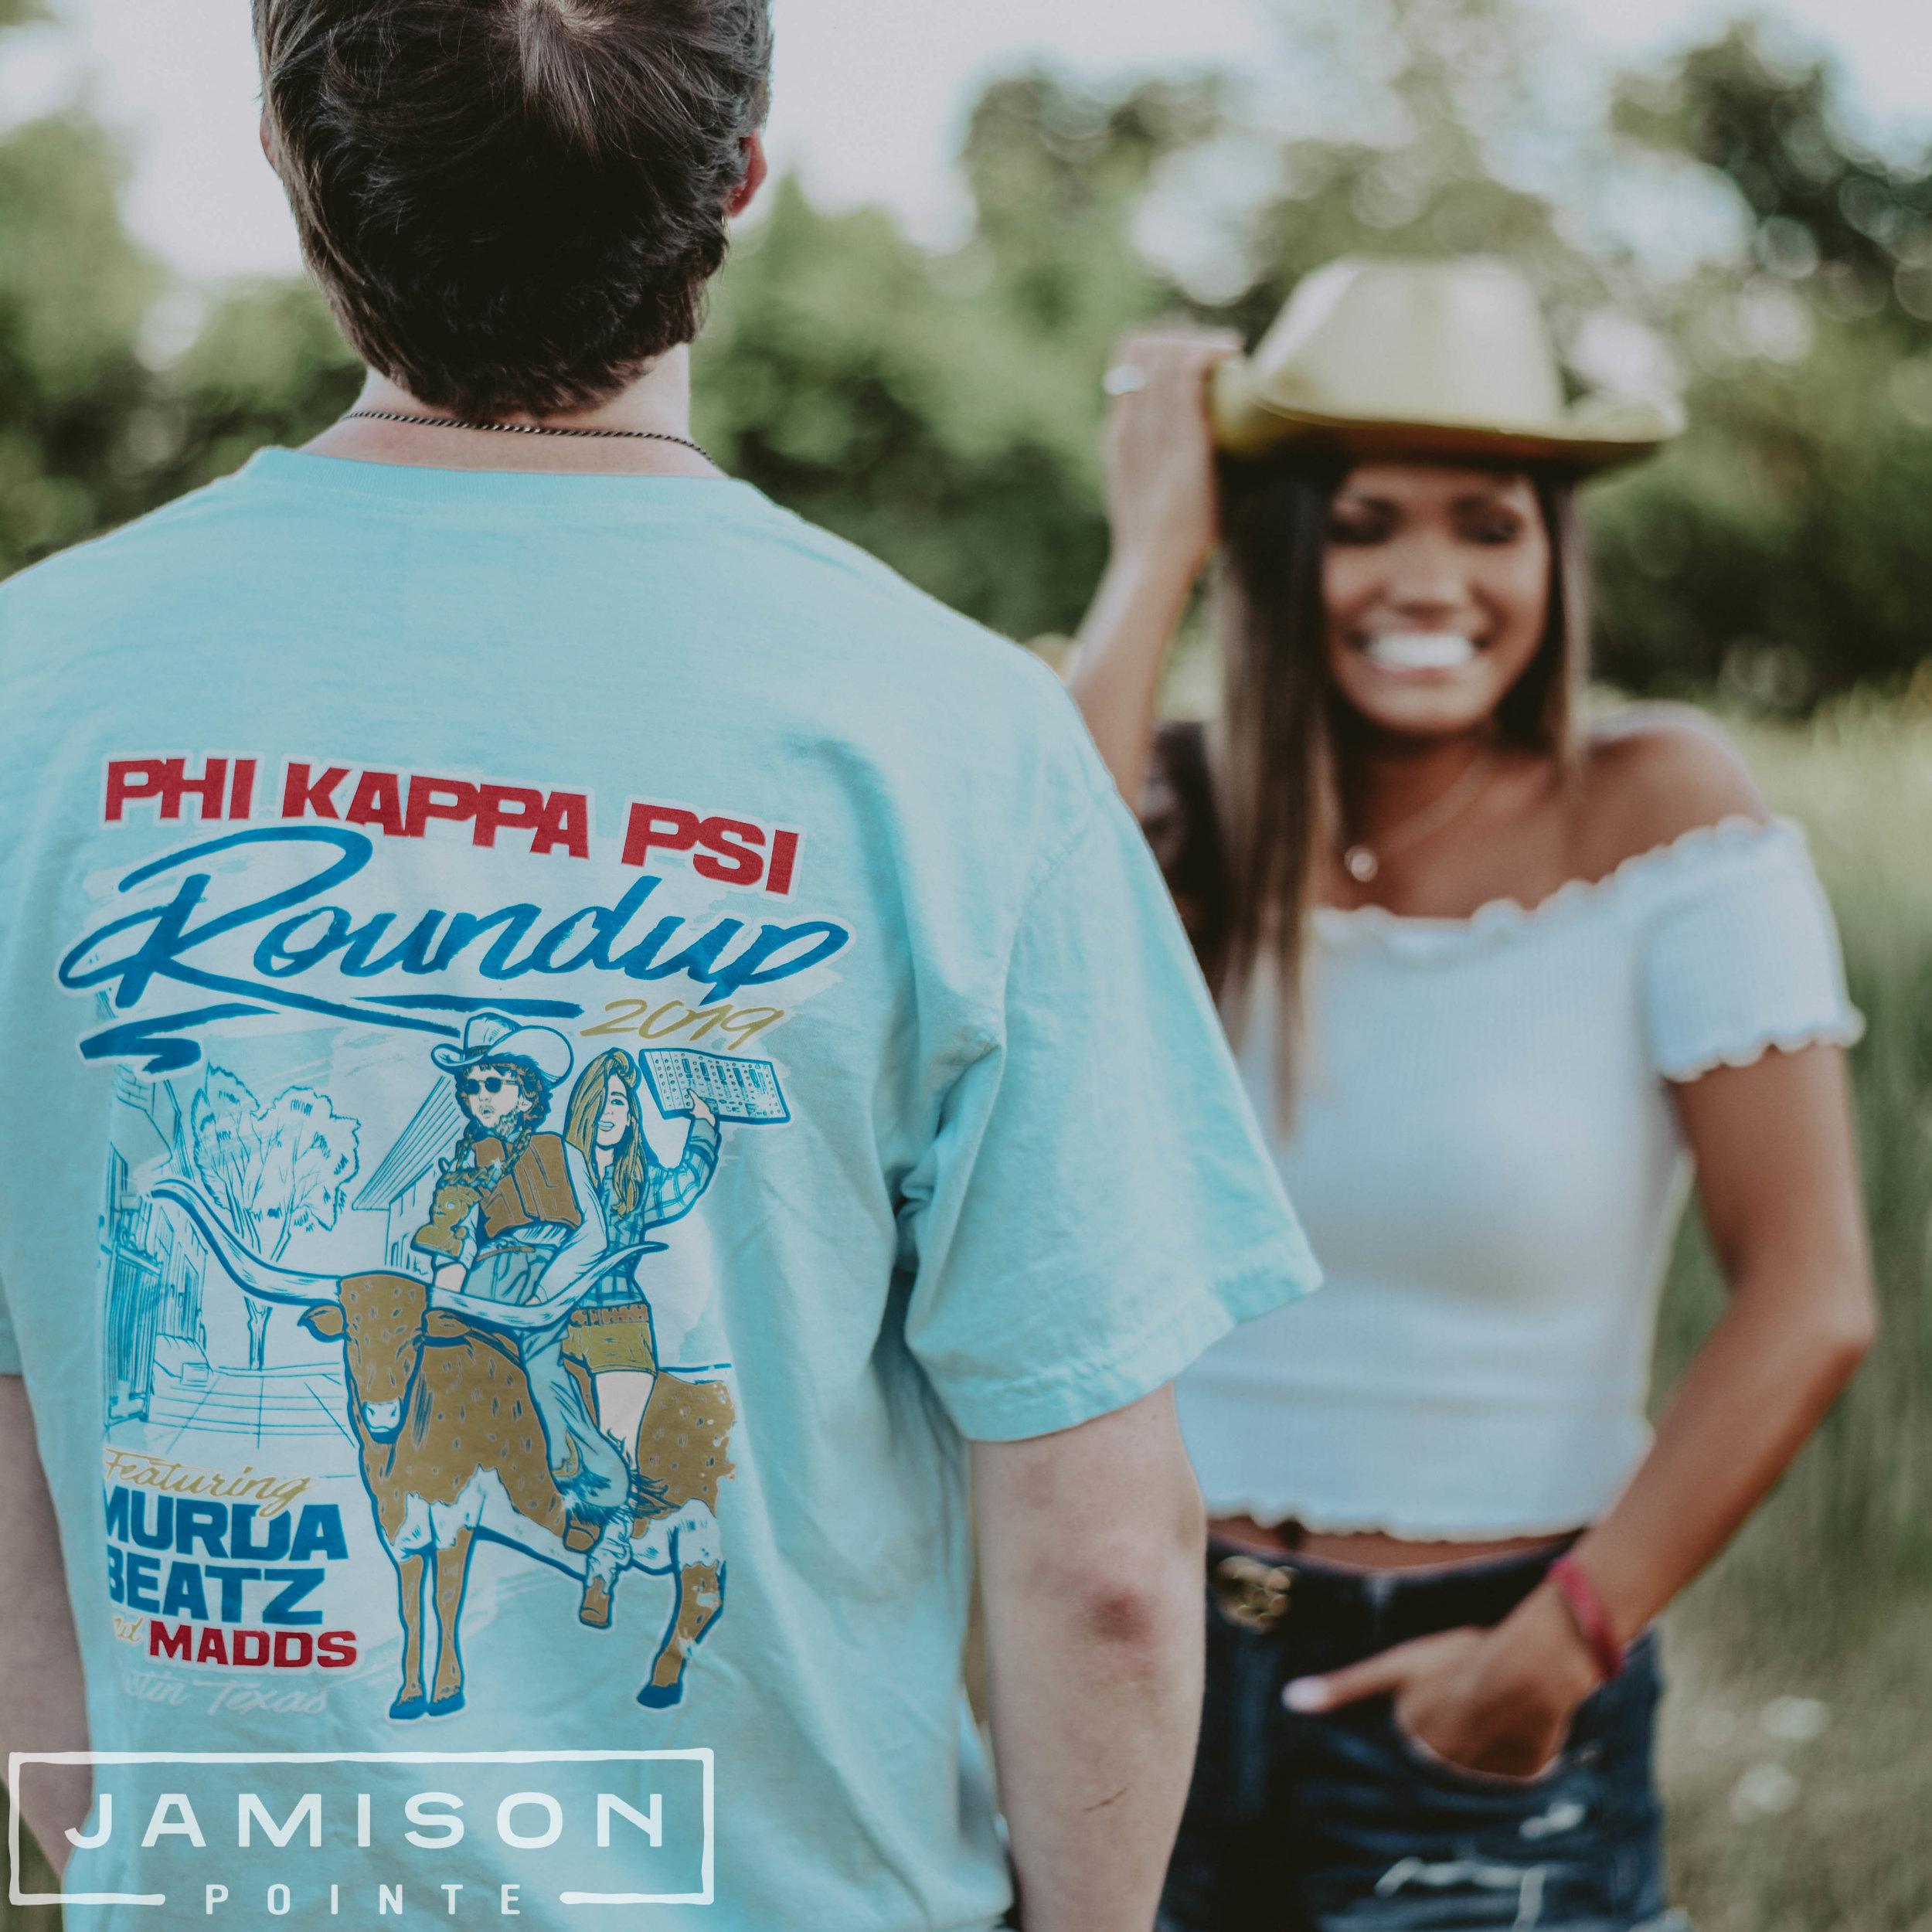 Phi Kappa Psi Roundup T-shirt